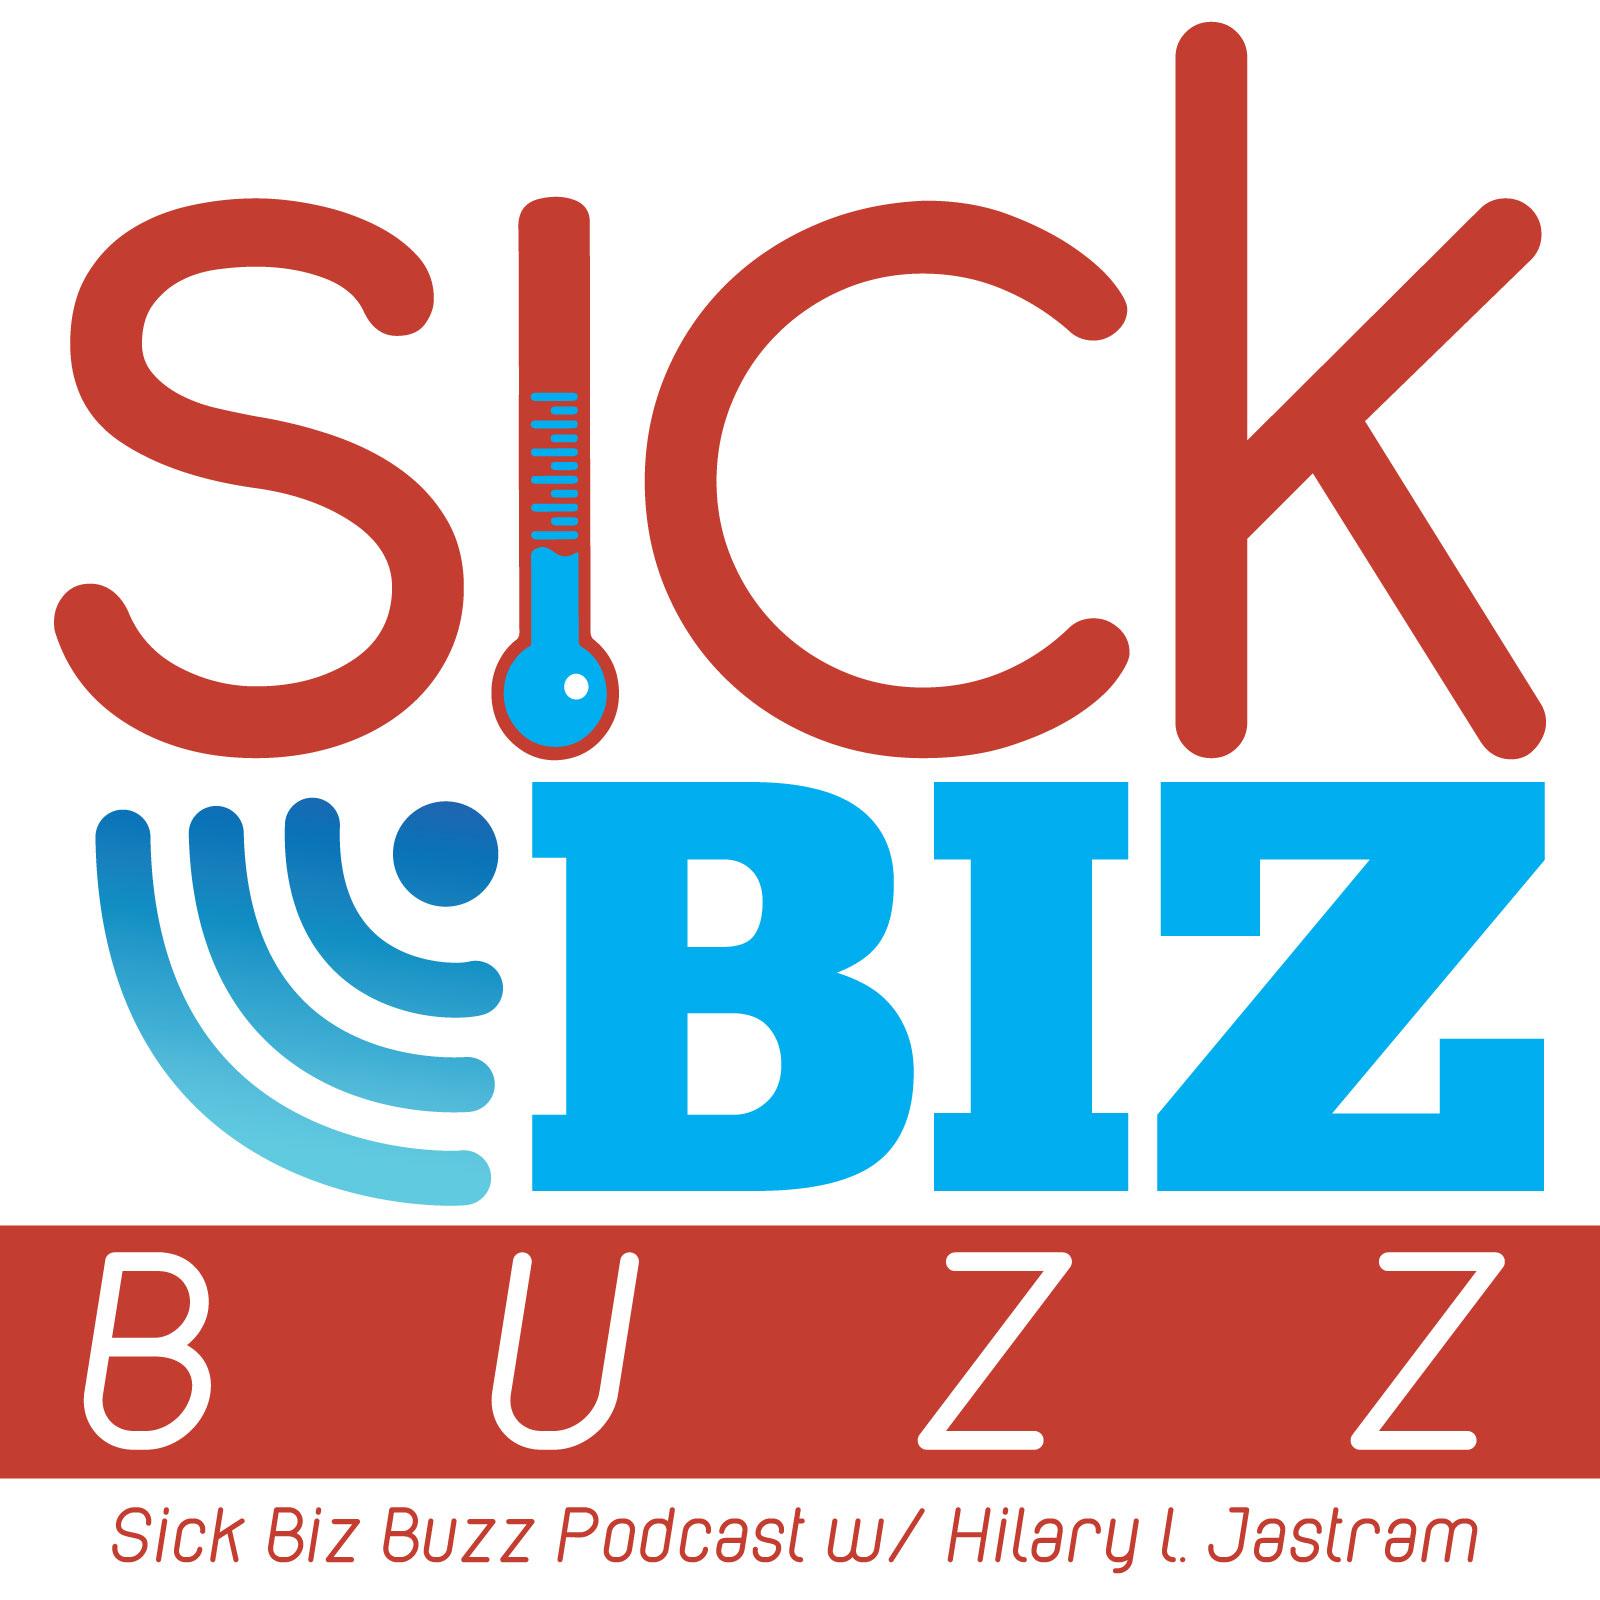 Sick Biz Buzz show art